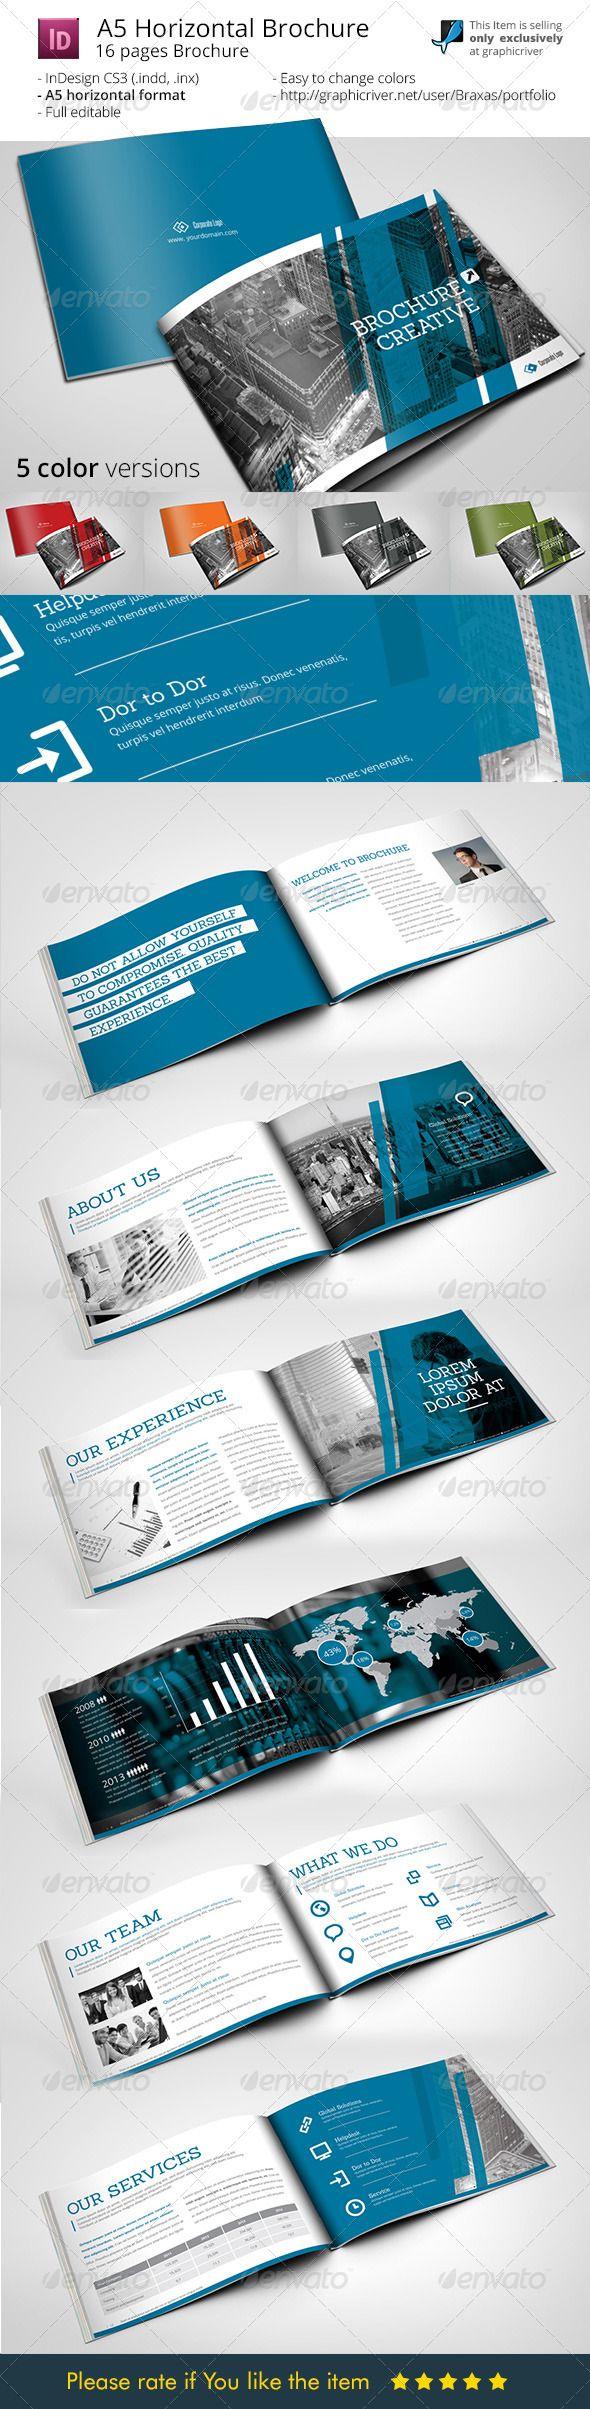 A5 Brochure Creative - Informational Brochures